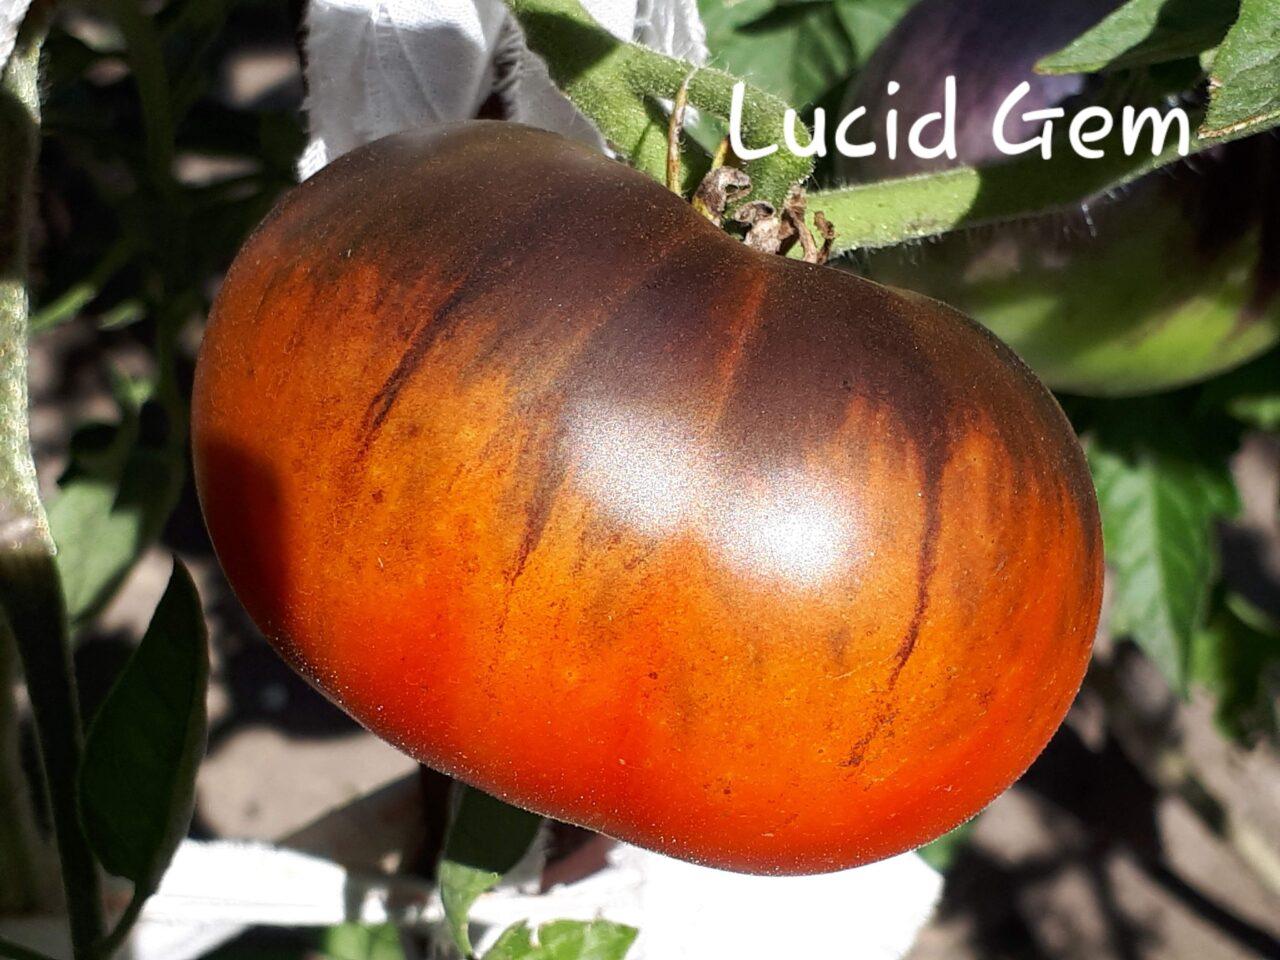 dojrzały pomidor Lucid Gem